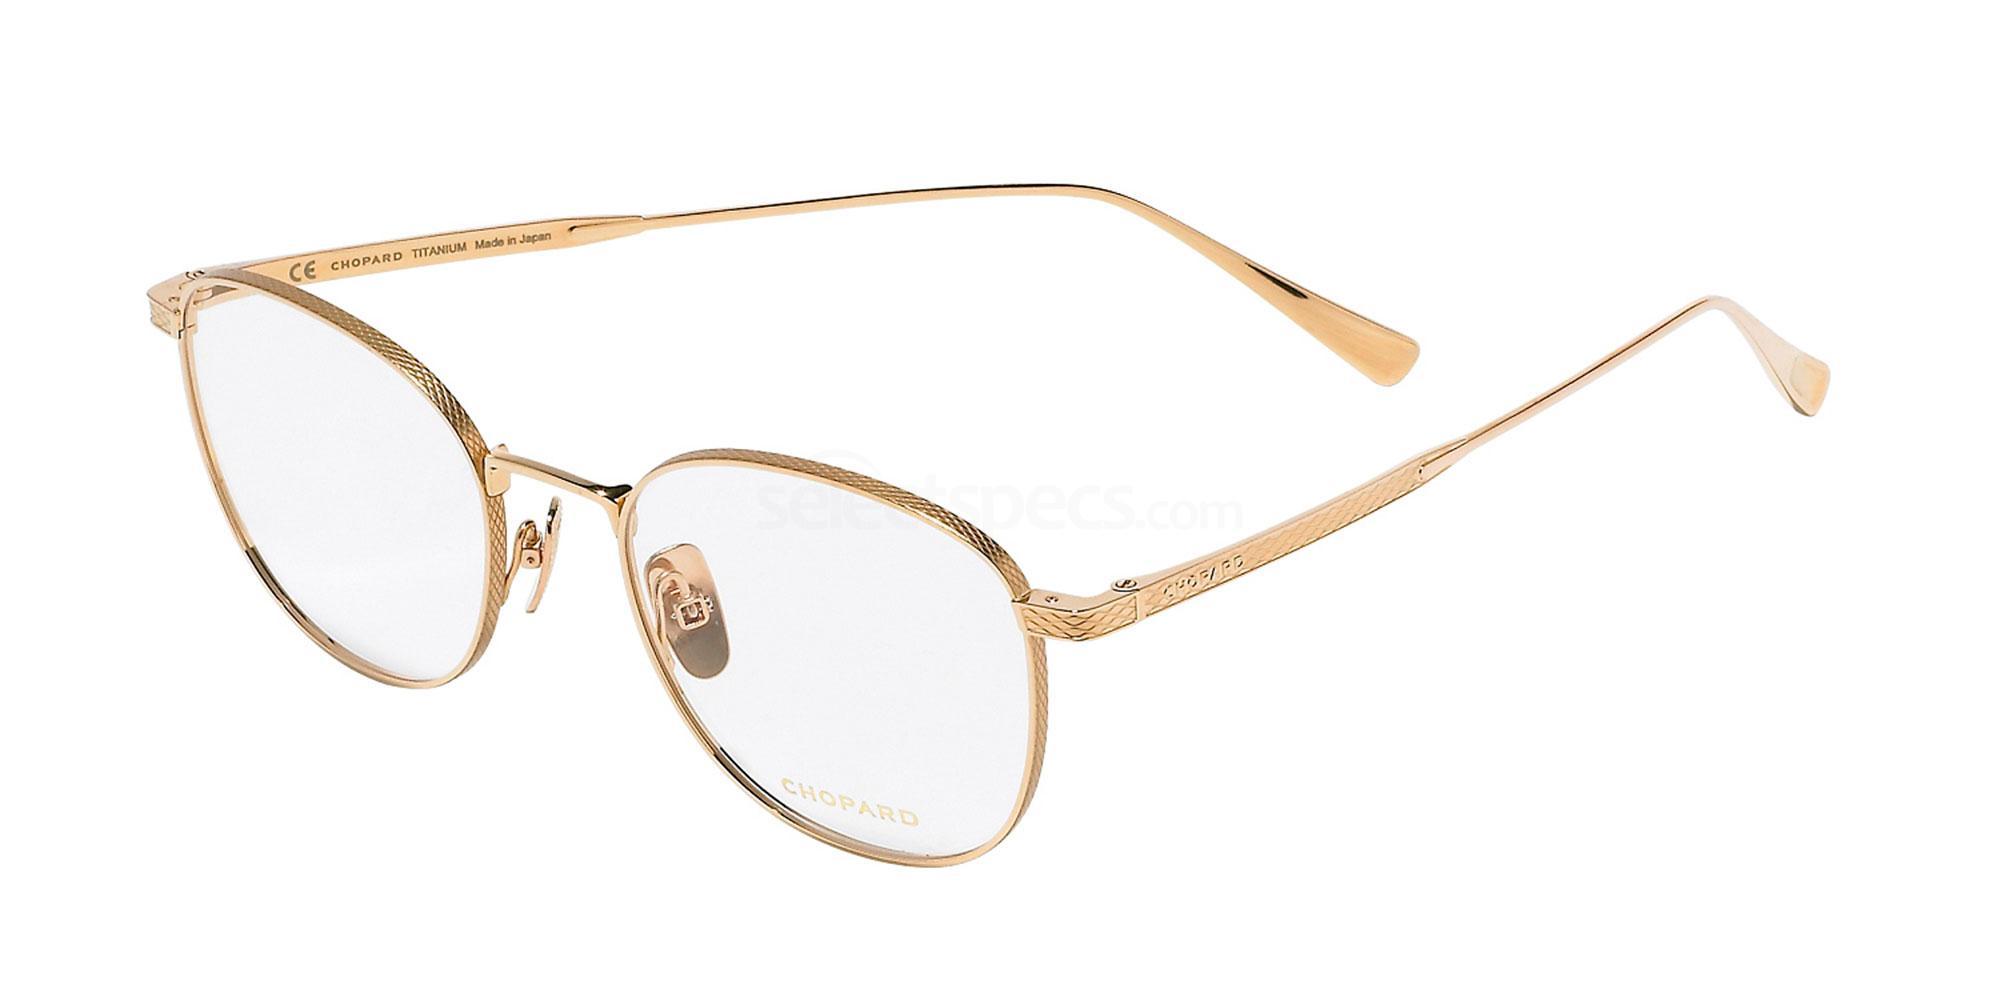 0349 VCHC55M Glasses, Chopard